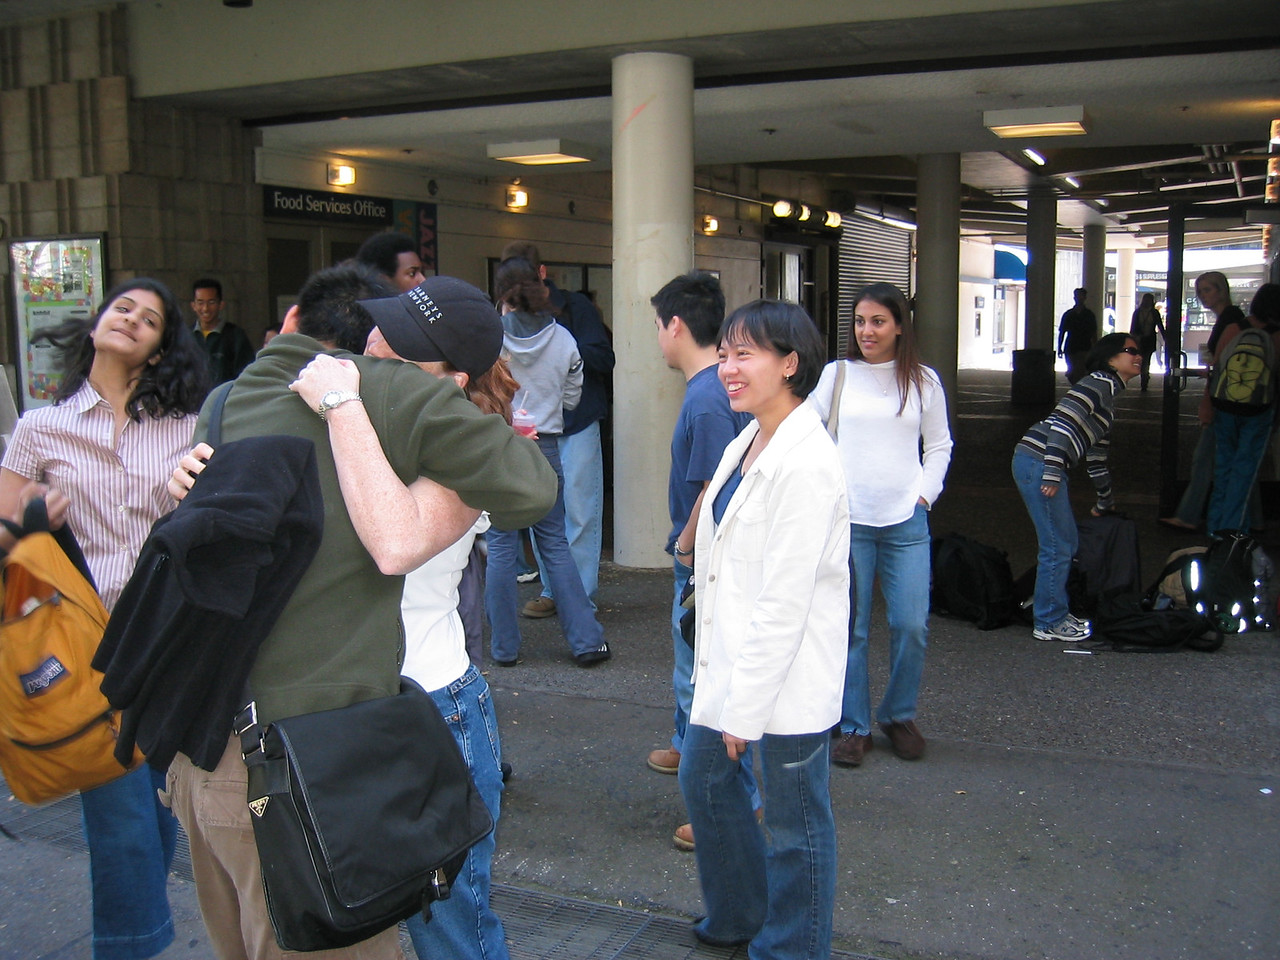 Monday Sproul 3-10-2003, Shaila hair toss, Kenji & Beth together again, AnnMarie